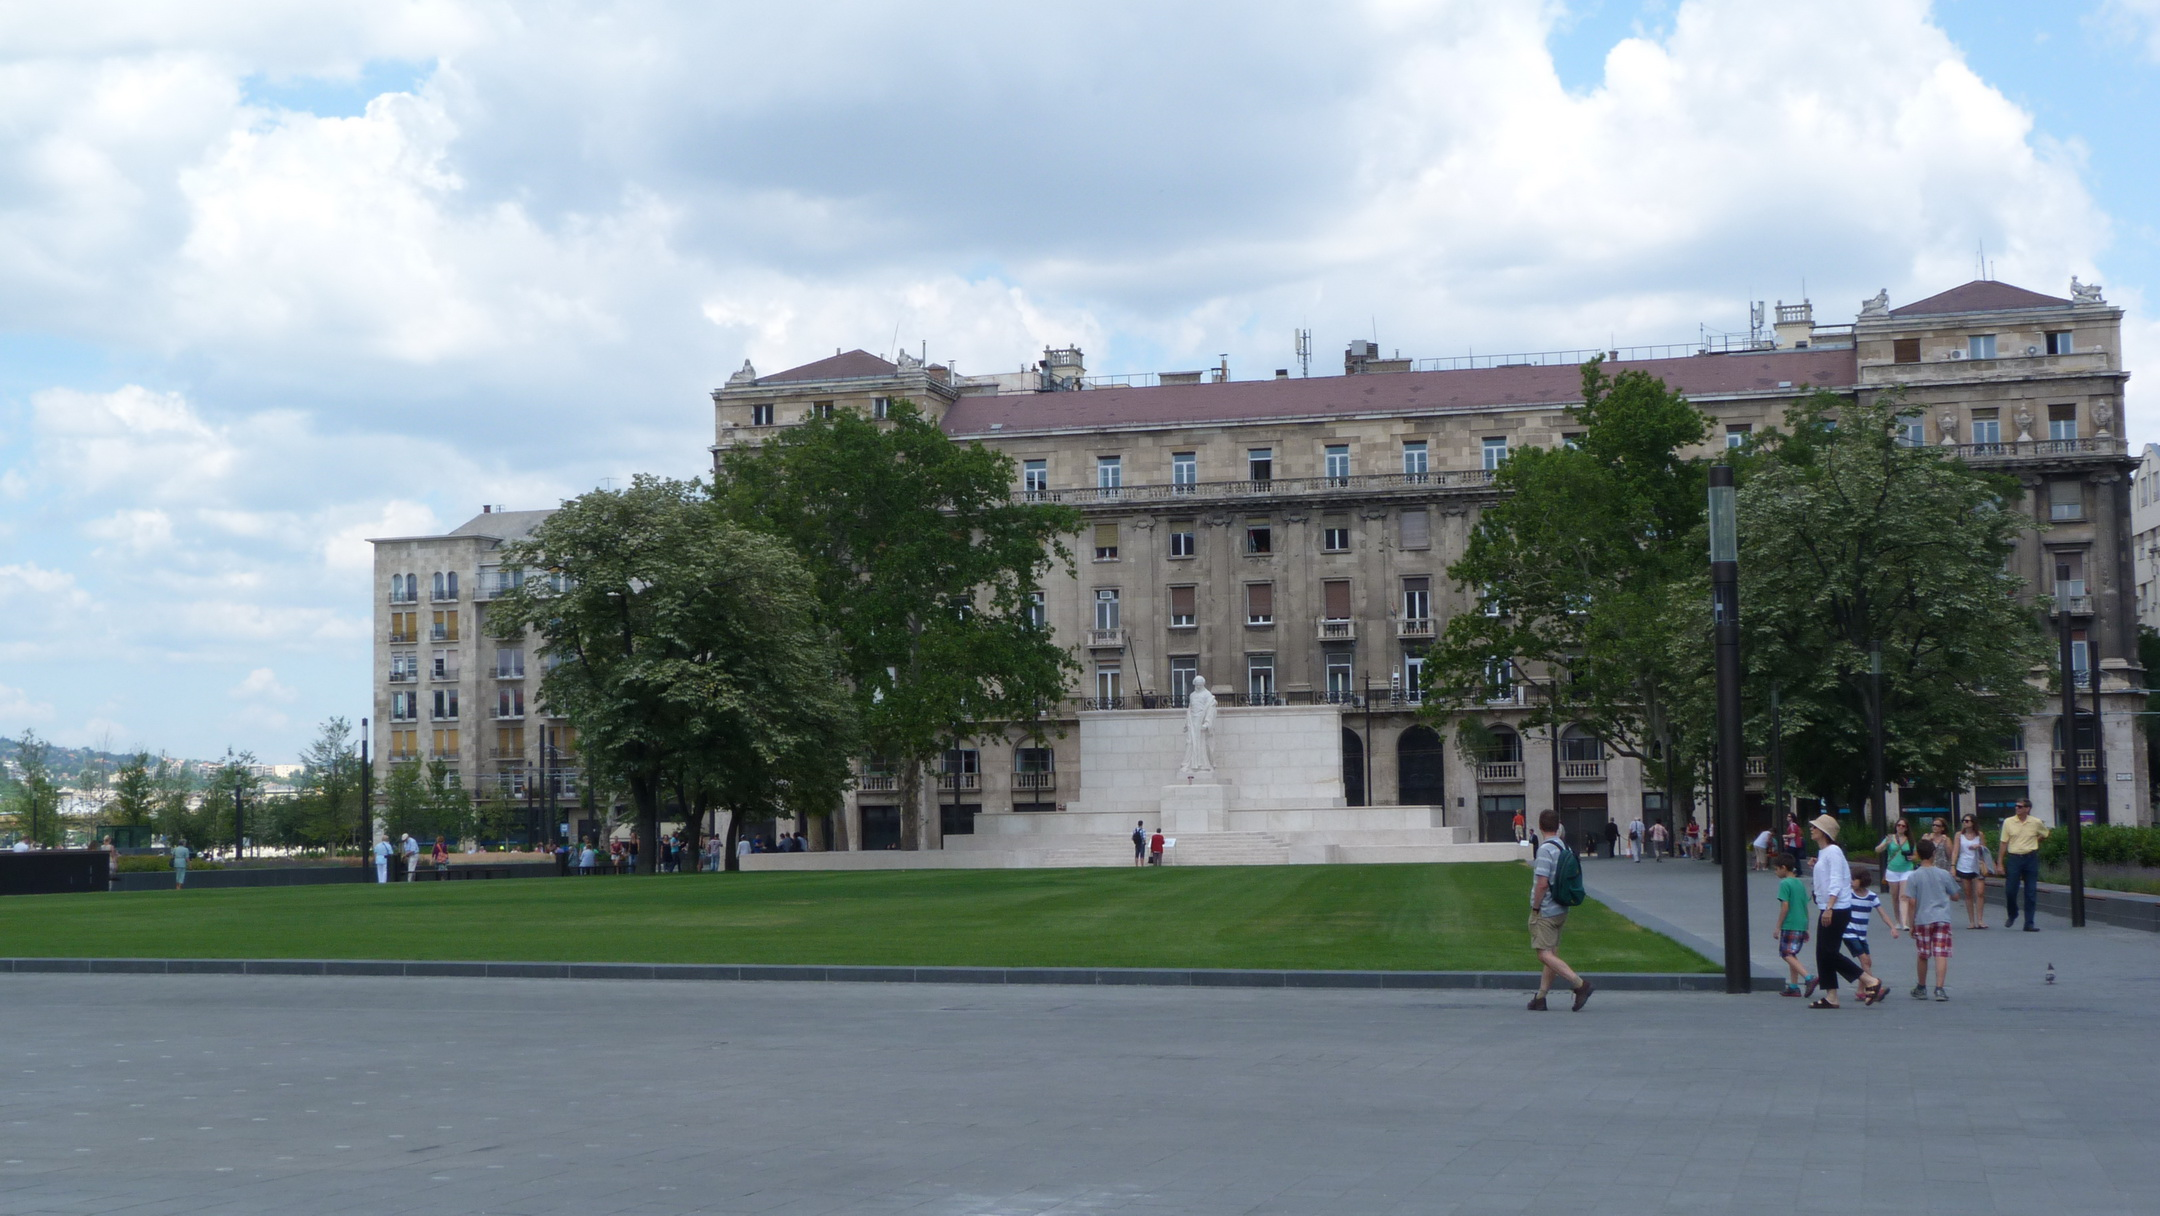 A Kossuth szobor